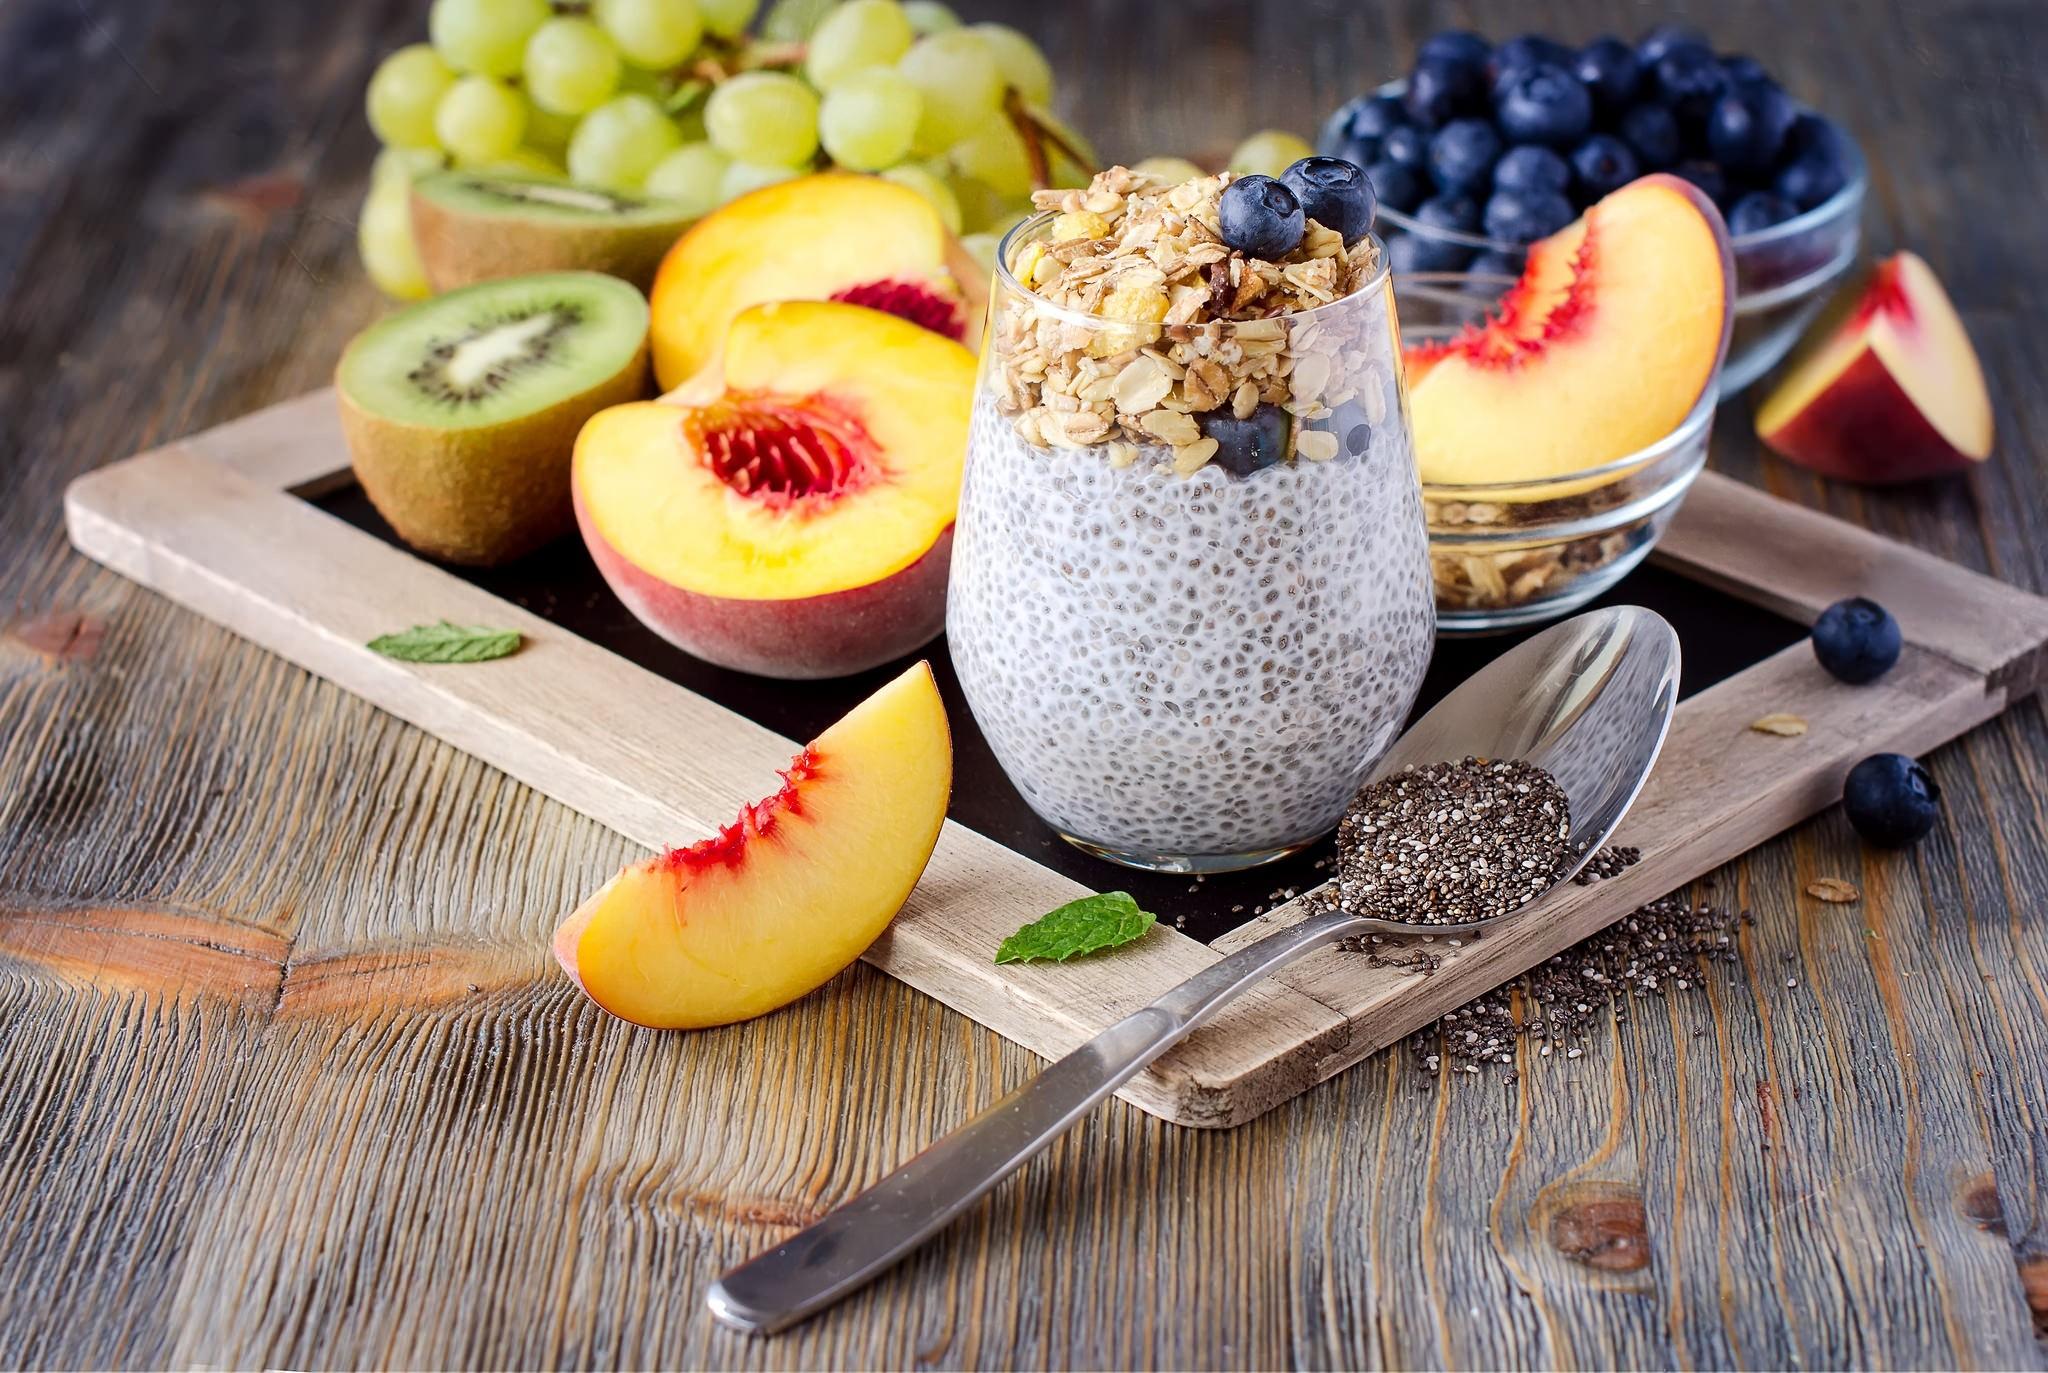 General 2048x1373 food spoon fruit blueberries peaches grapes kiwi (fruit) oatmeal mint